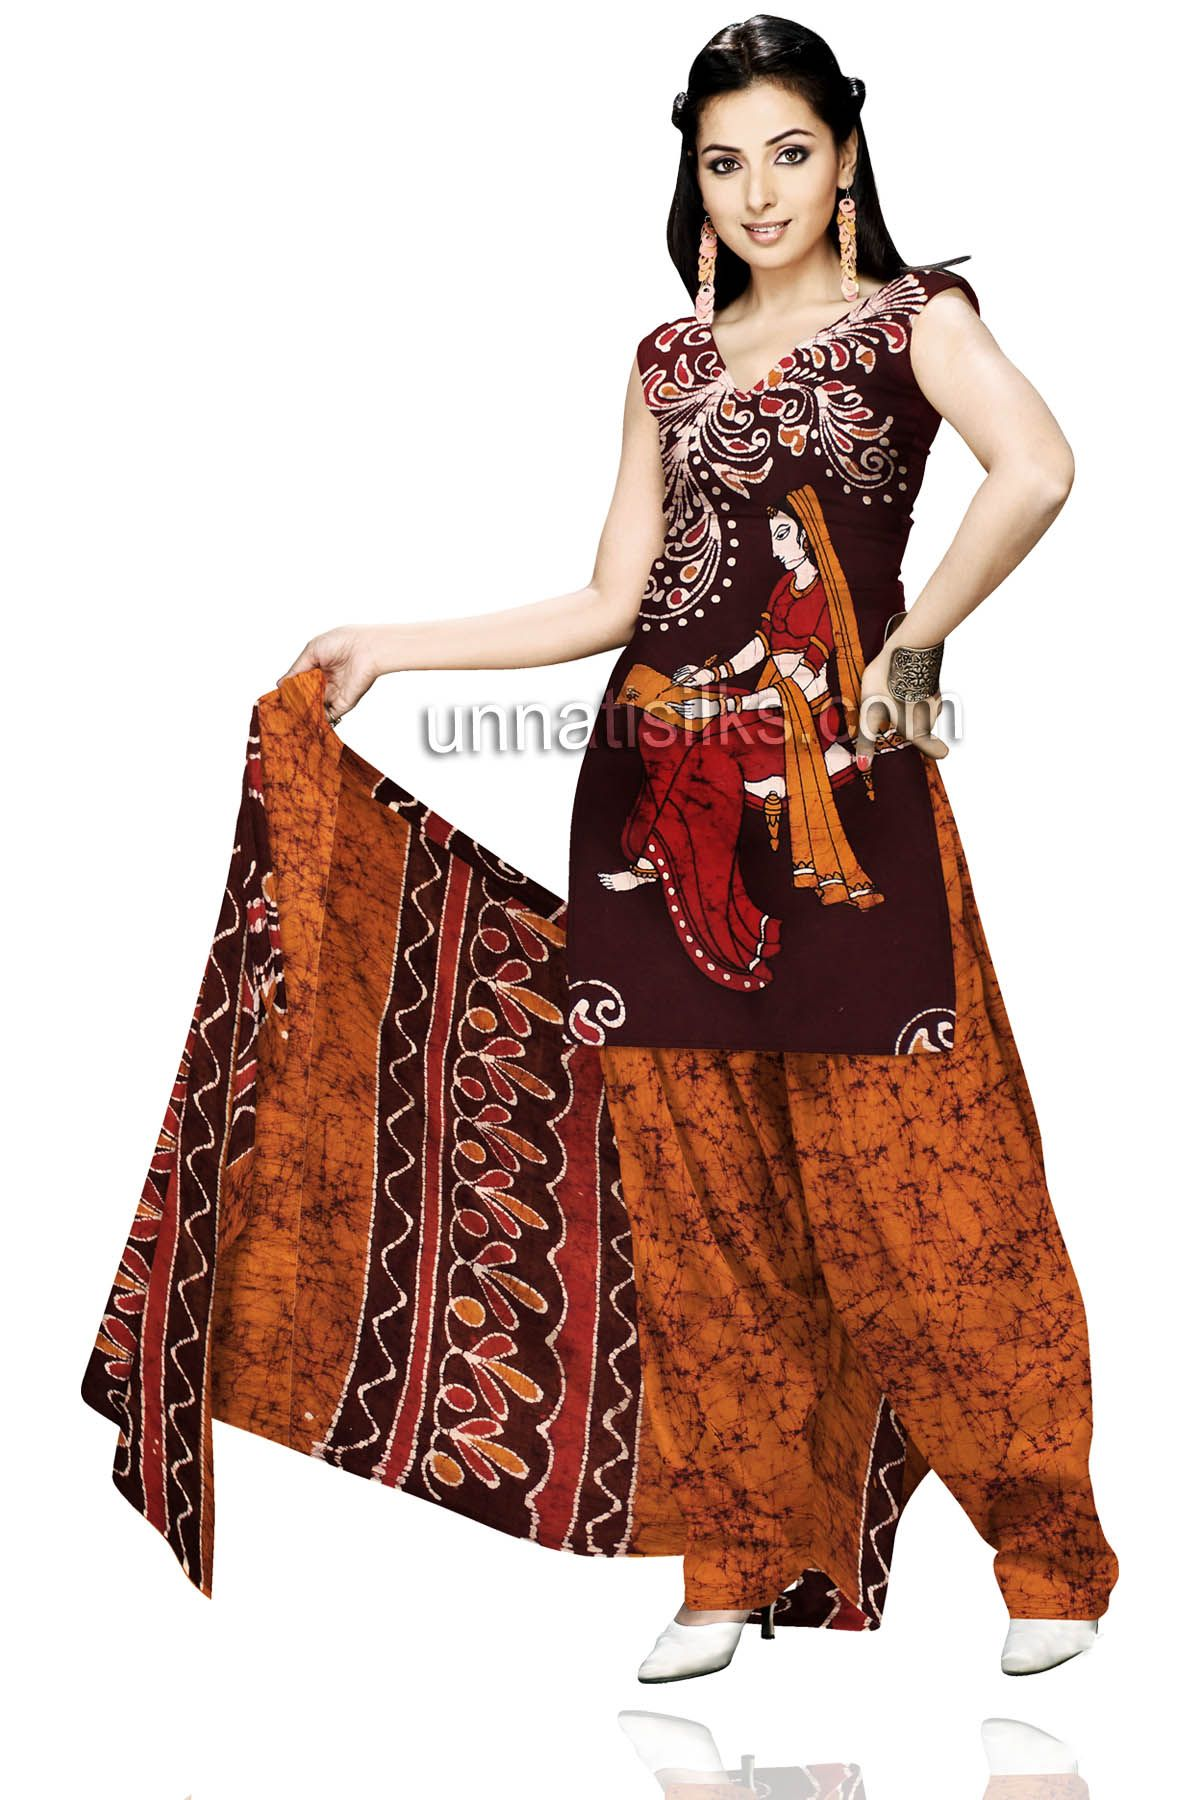 Online Shopping Stores In Hyderabad India For Women Wear Clothes Like Punjabi Dress Materials Unstitched Salwar Kameez C Womens Dresses Dress Materials Dresses